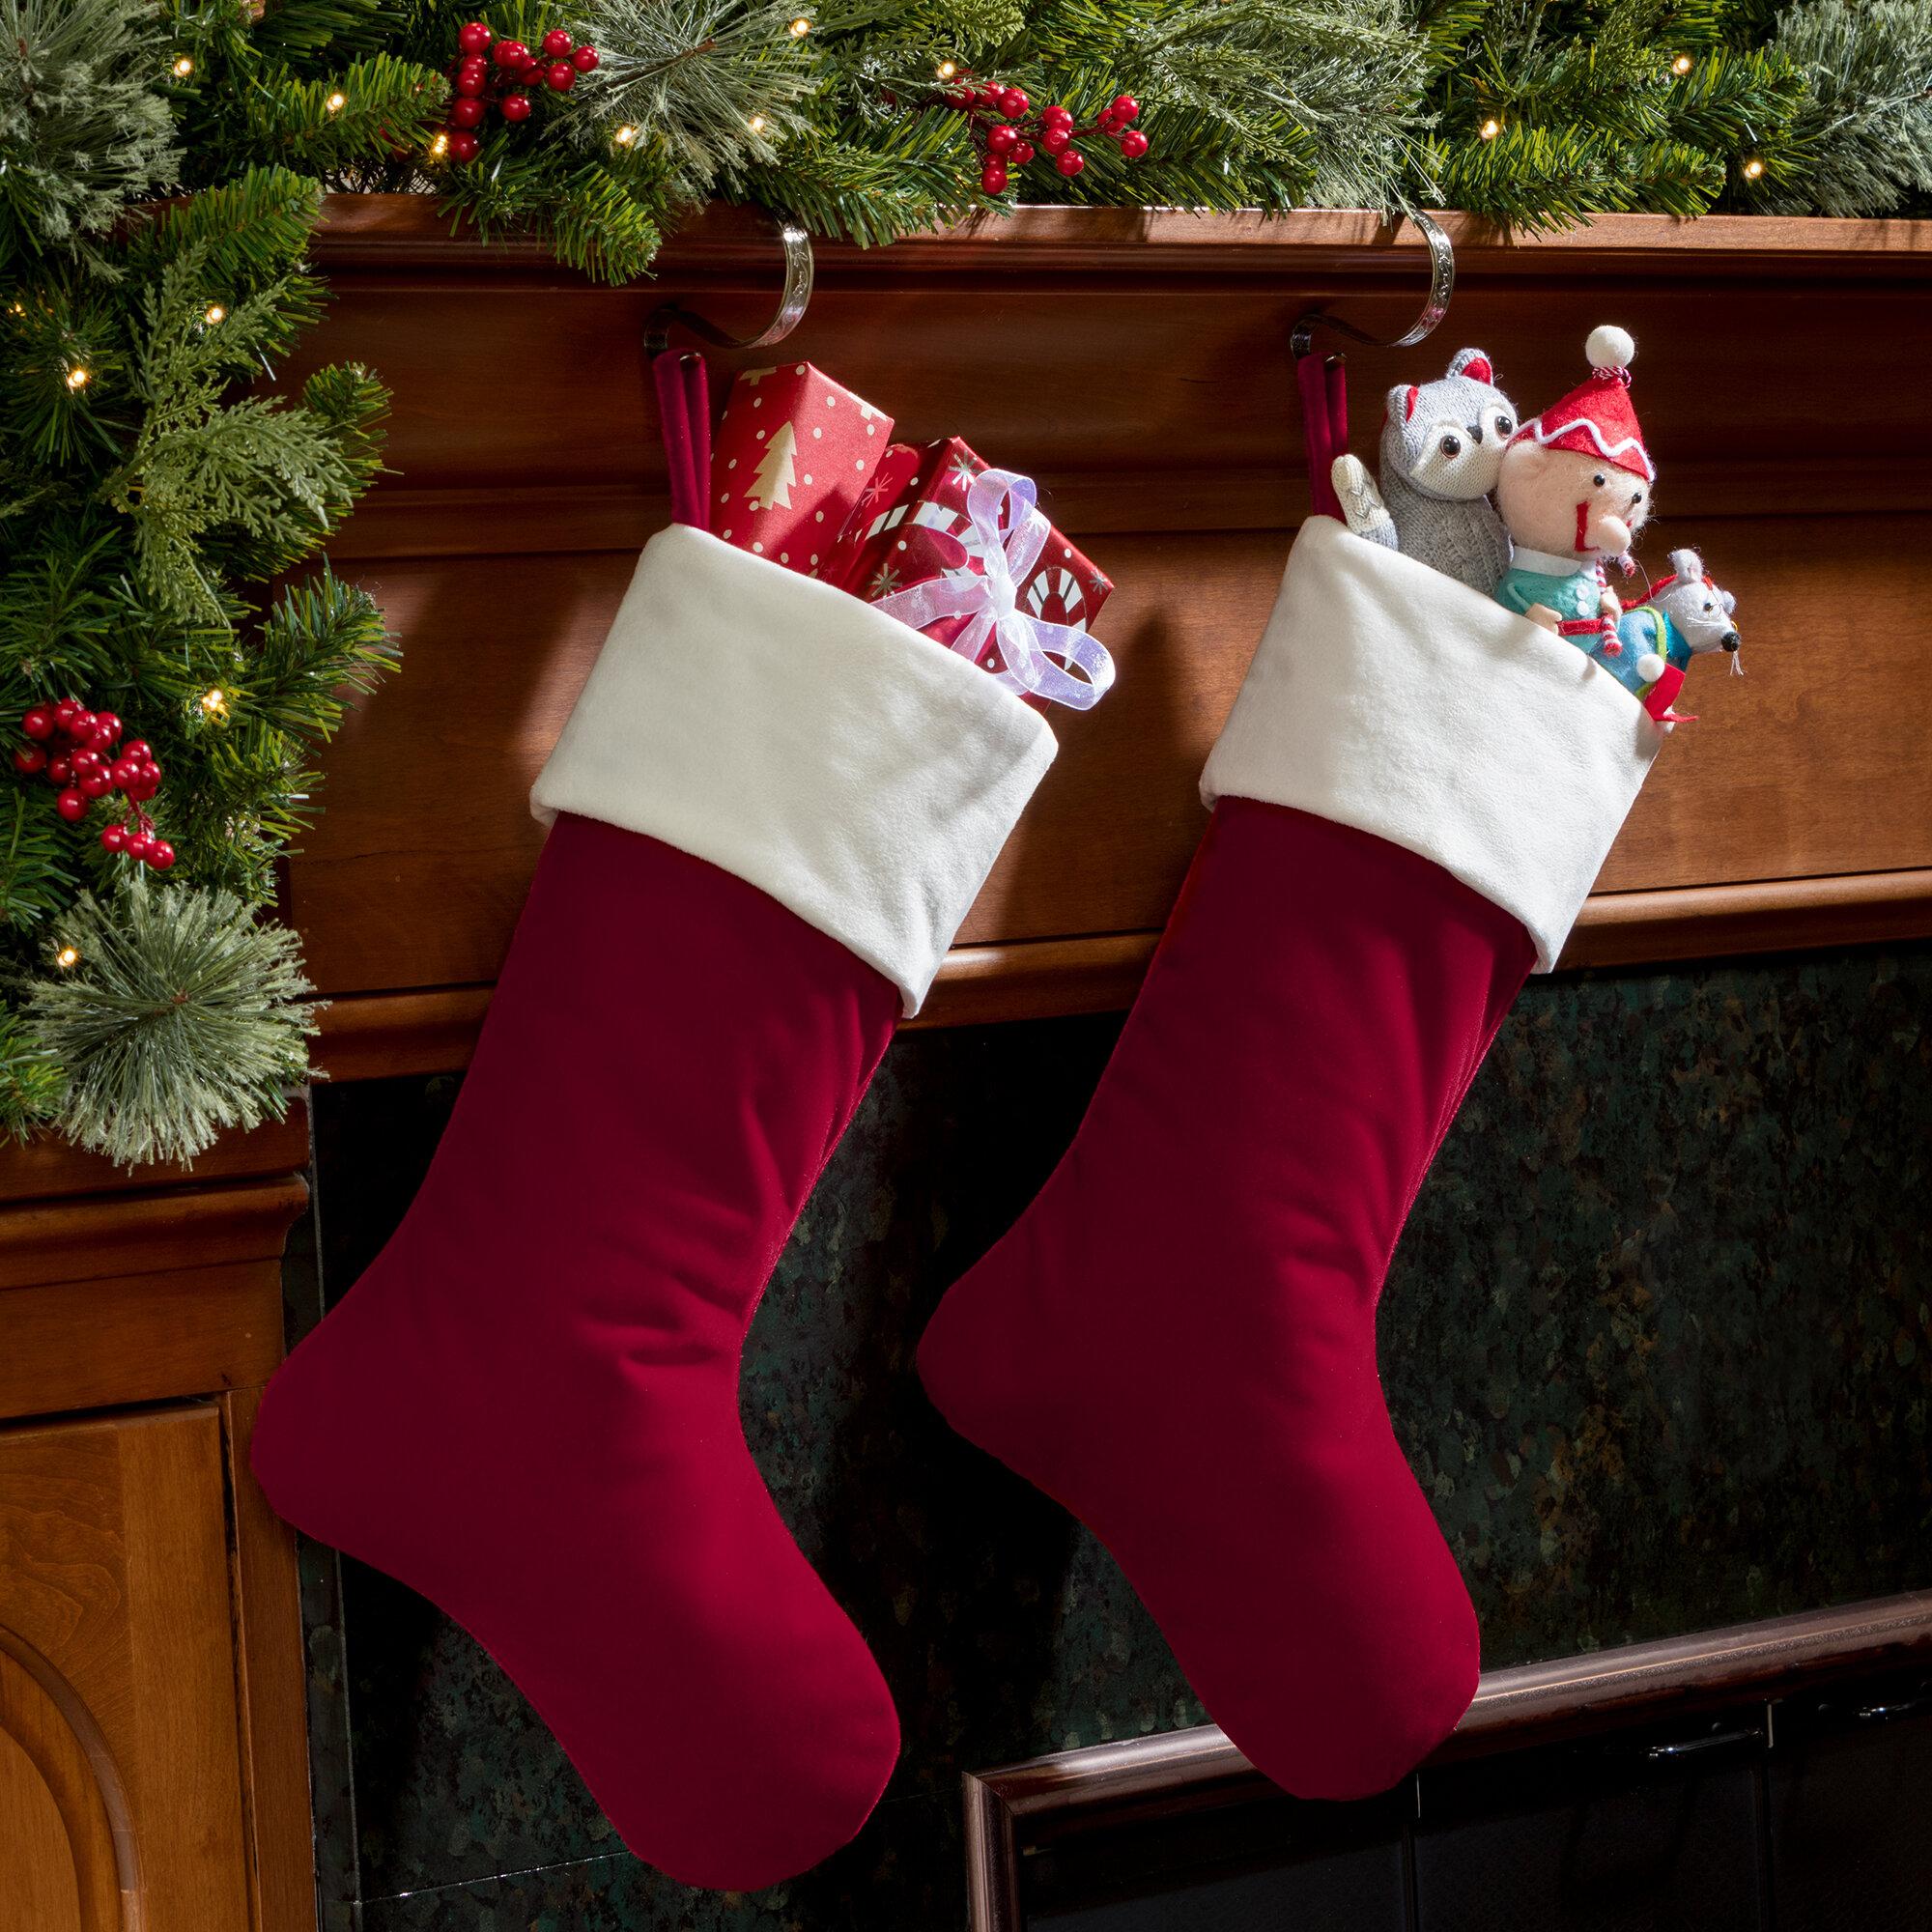 Haute Decor Hangright Deluxe Christmas Stocking Reviews Wayfair Ca